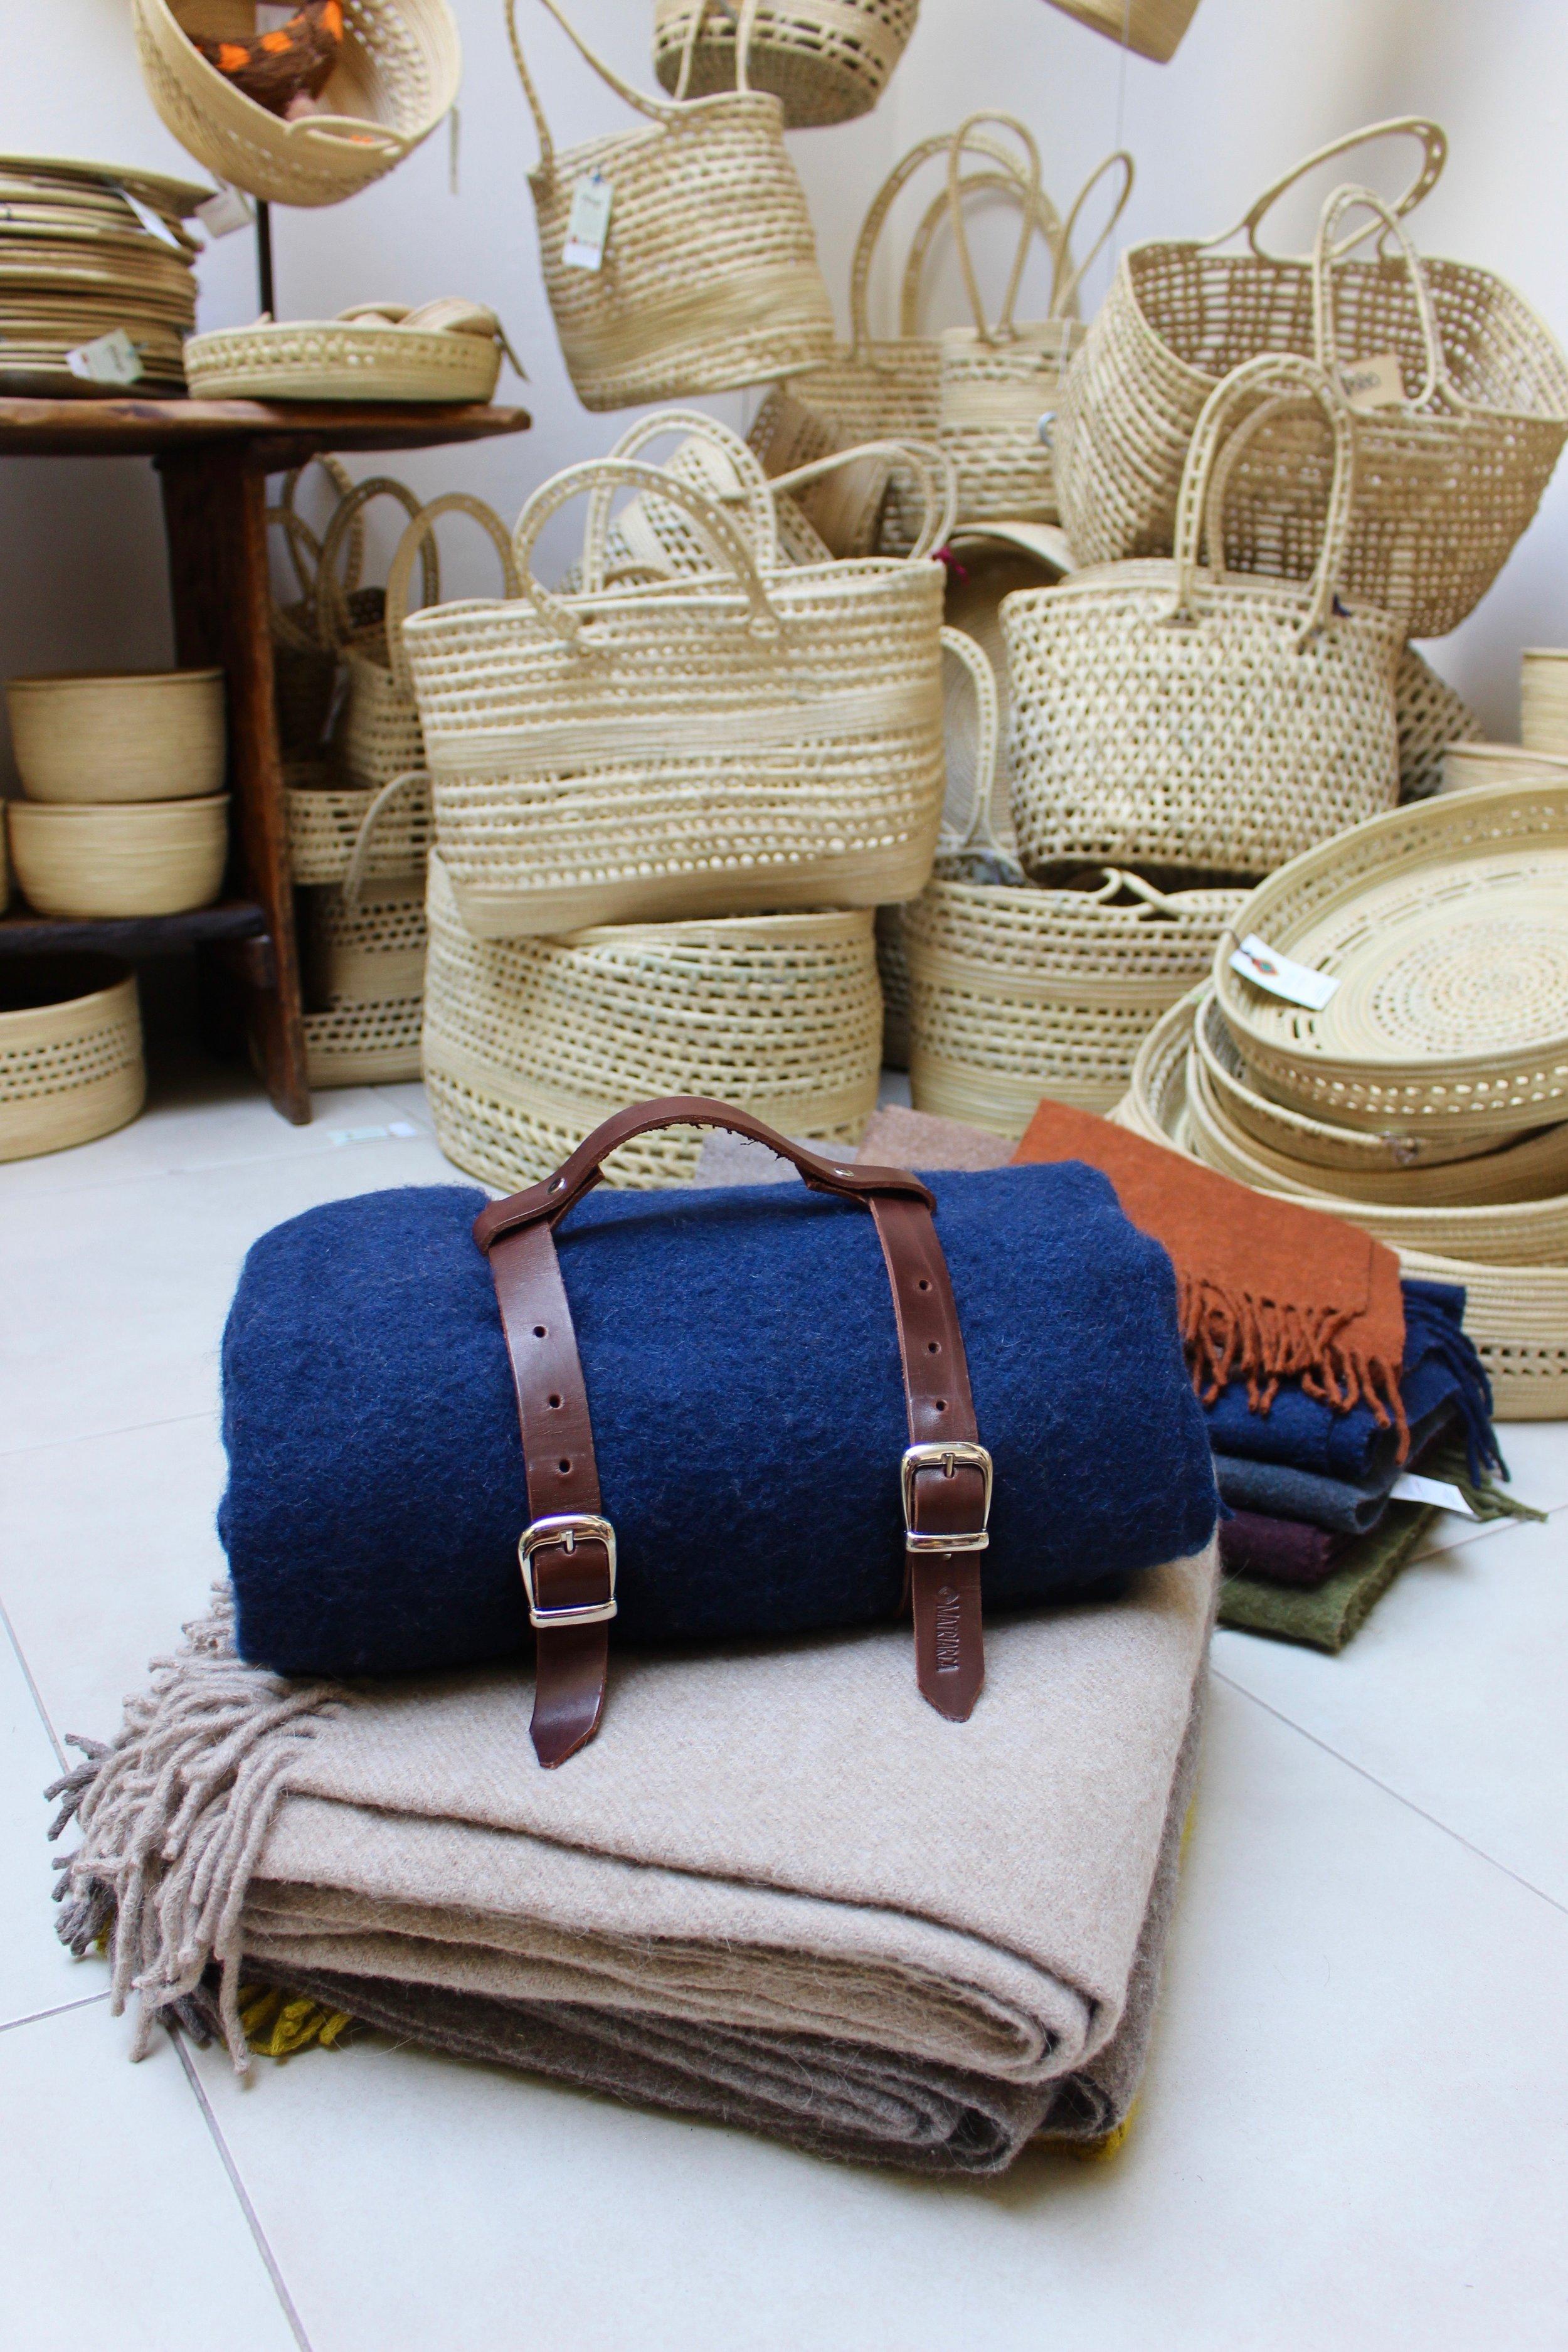 Handmade artisanal llama wool blankets